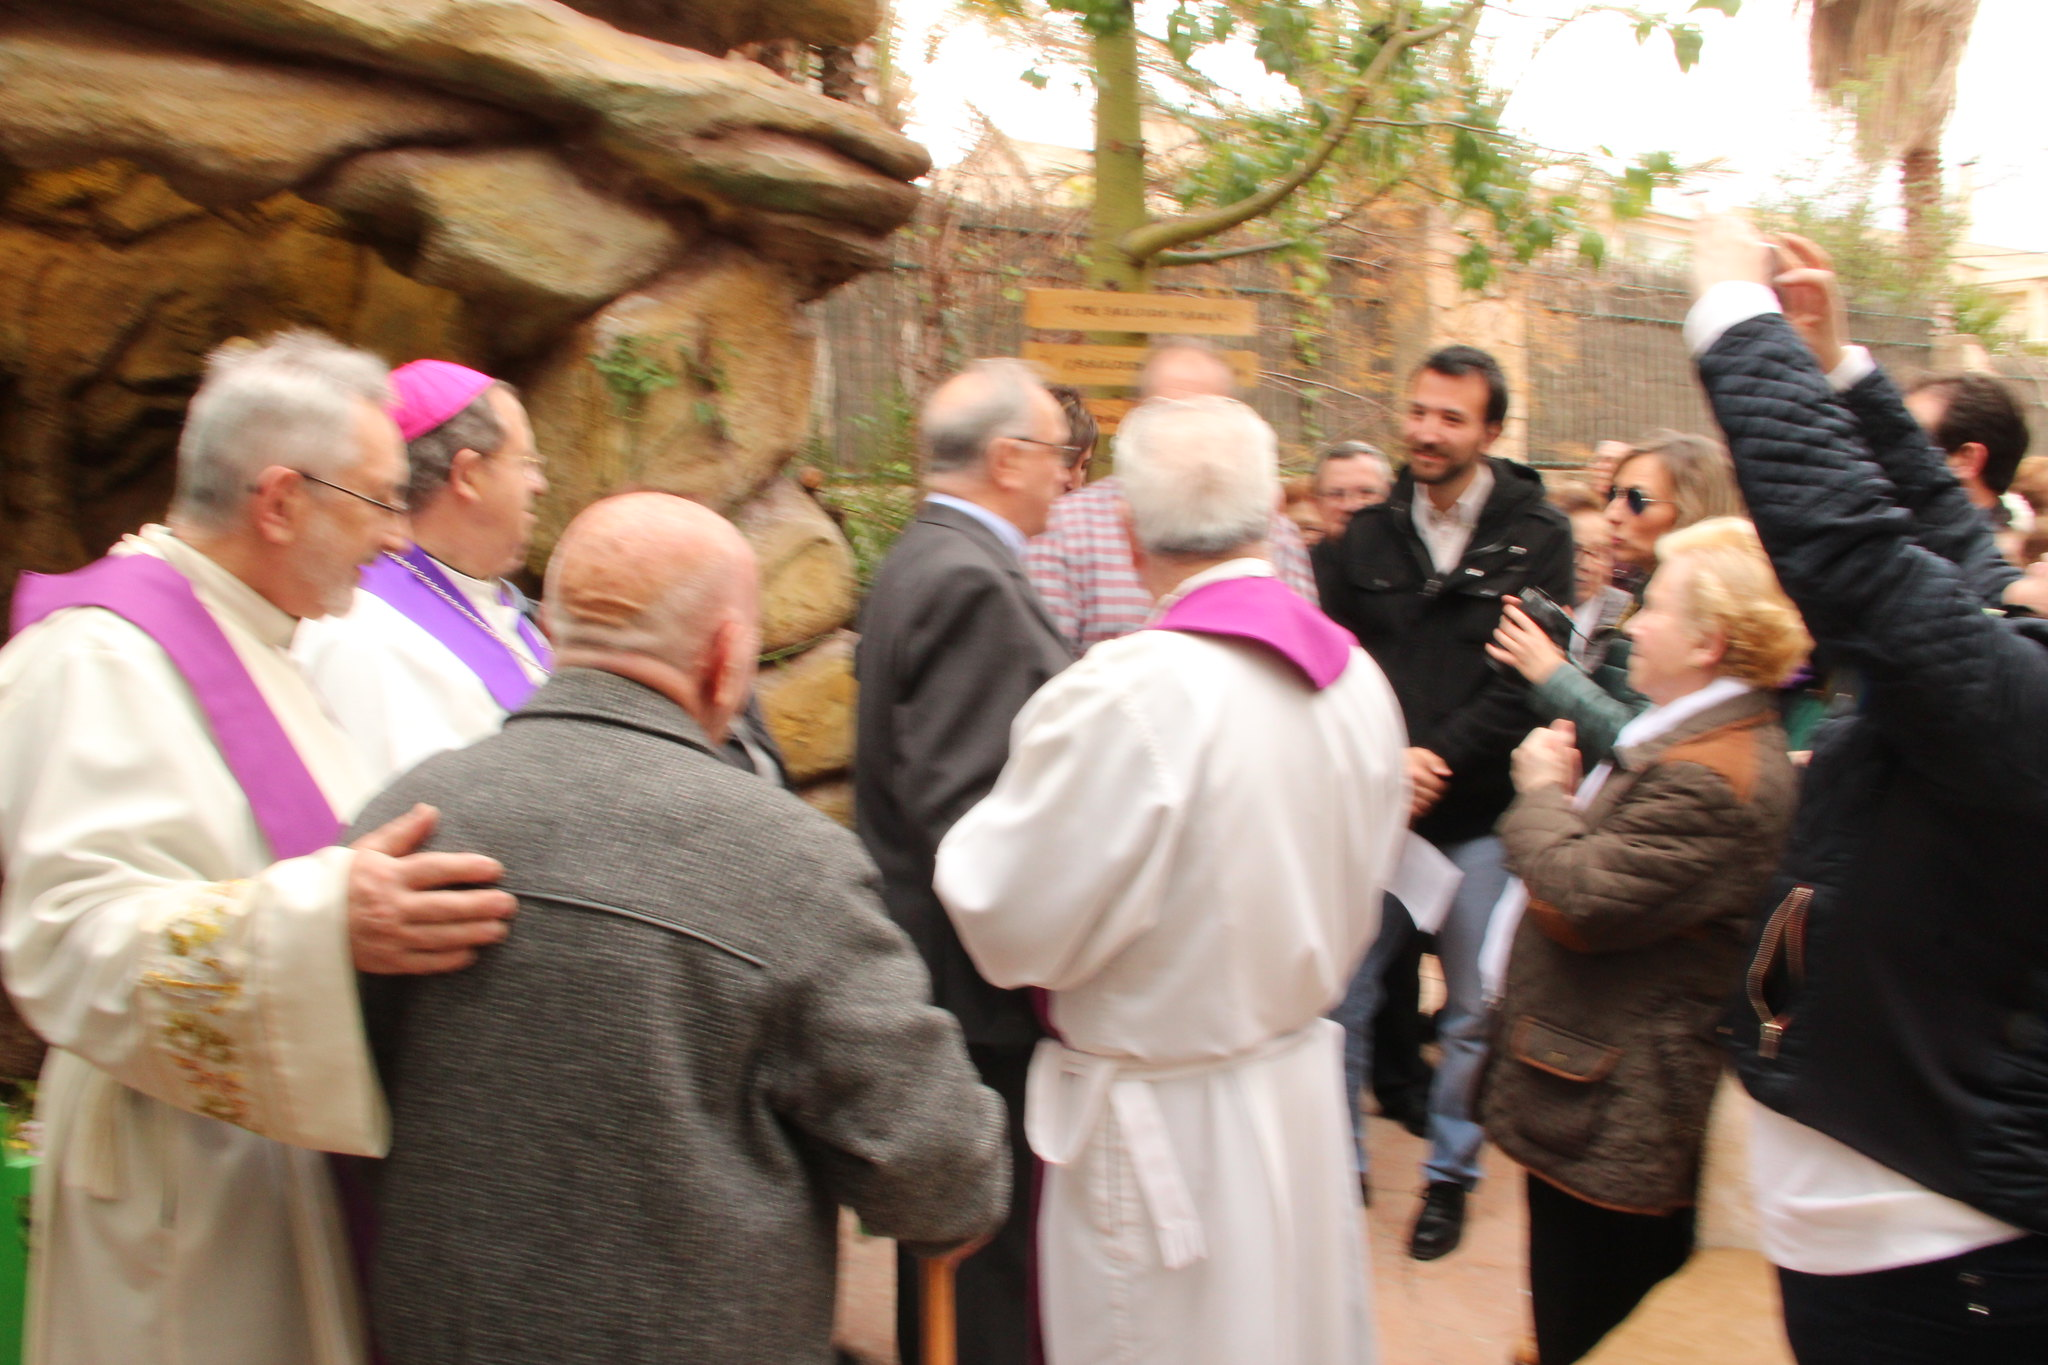 (2016-02-13) - Inauguración Virgen De Lourdes, La Molineta - Archivo La Molineta (088)